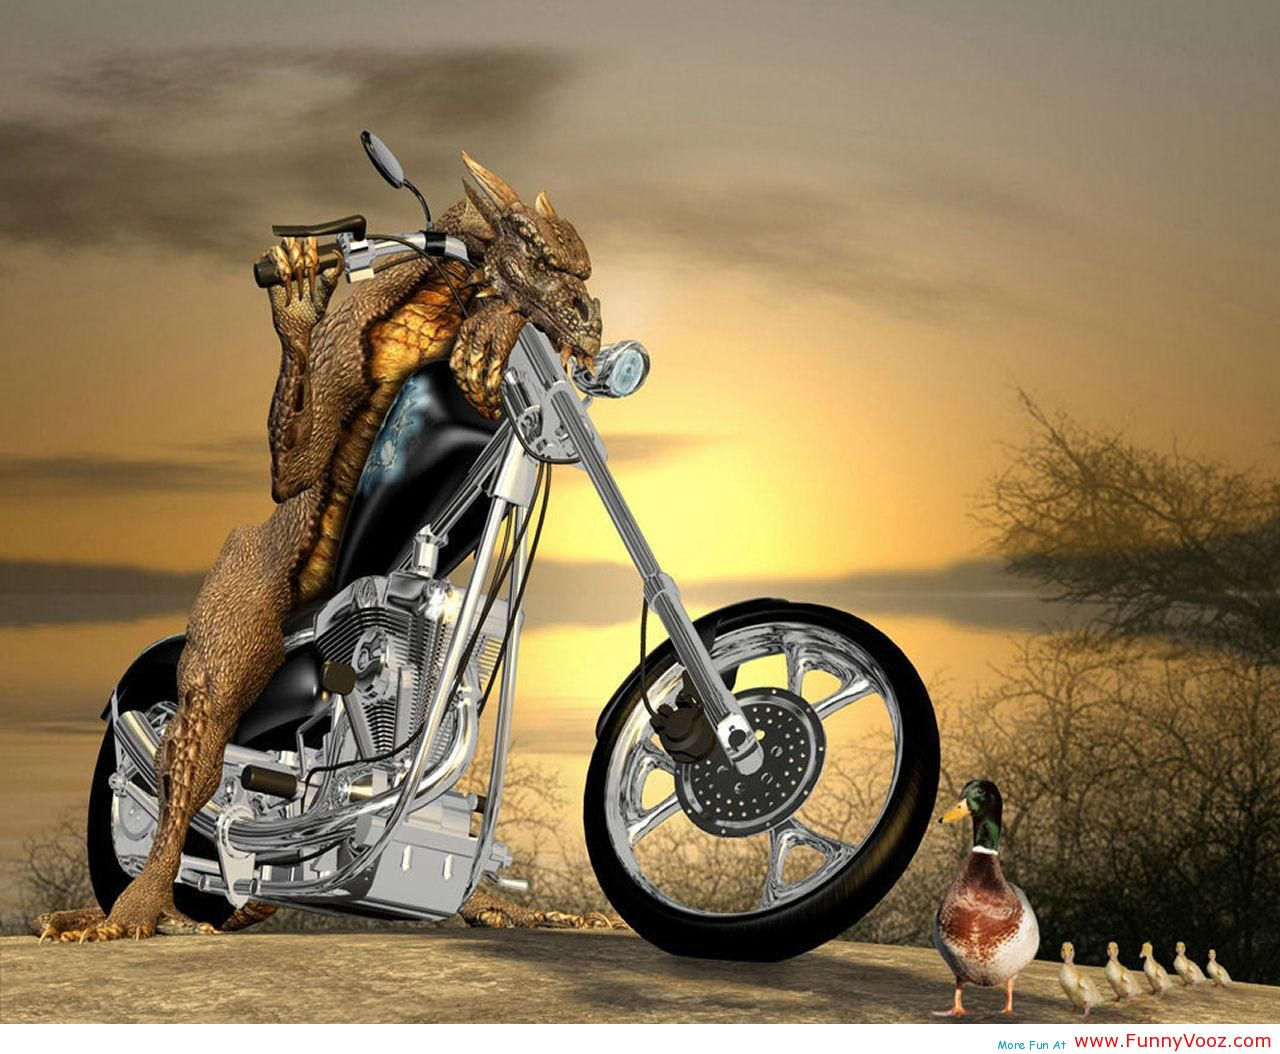 Funny bike accident image, sports bike crash picture, bike ...